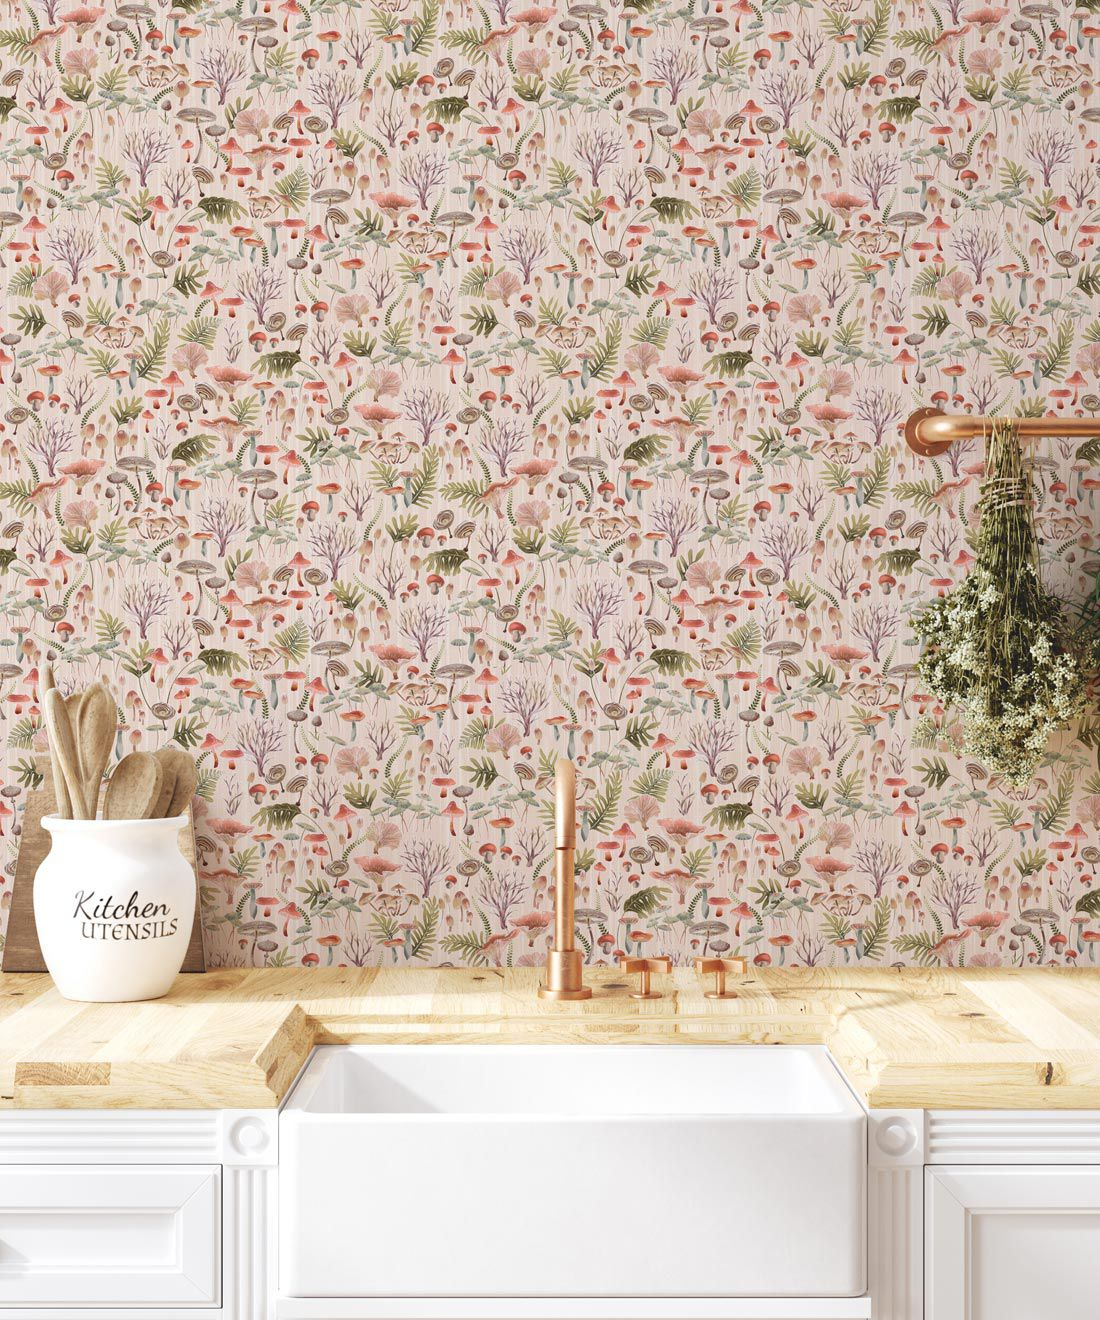 Fungi Wallpaper • Eloise Short • Vintage Floral Wallpaper •Granny Chic Wallpaper • Grandmillennial Style Wallpaper •Latte •Insitu